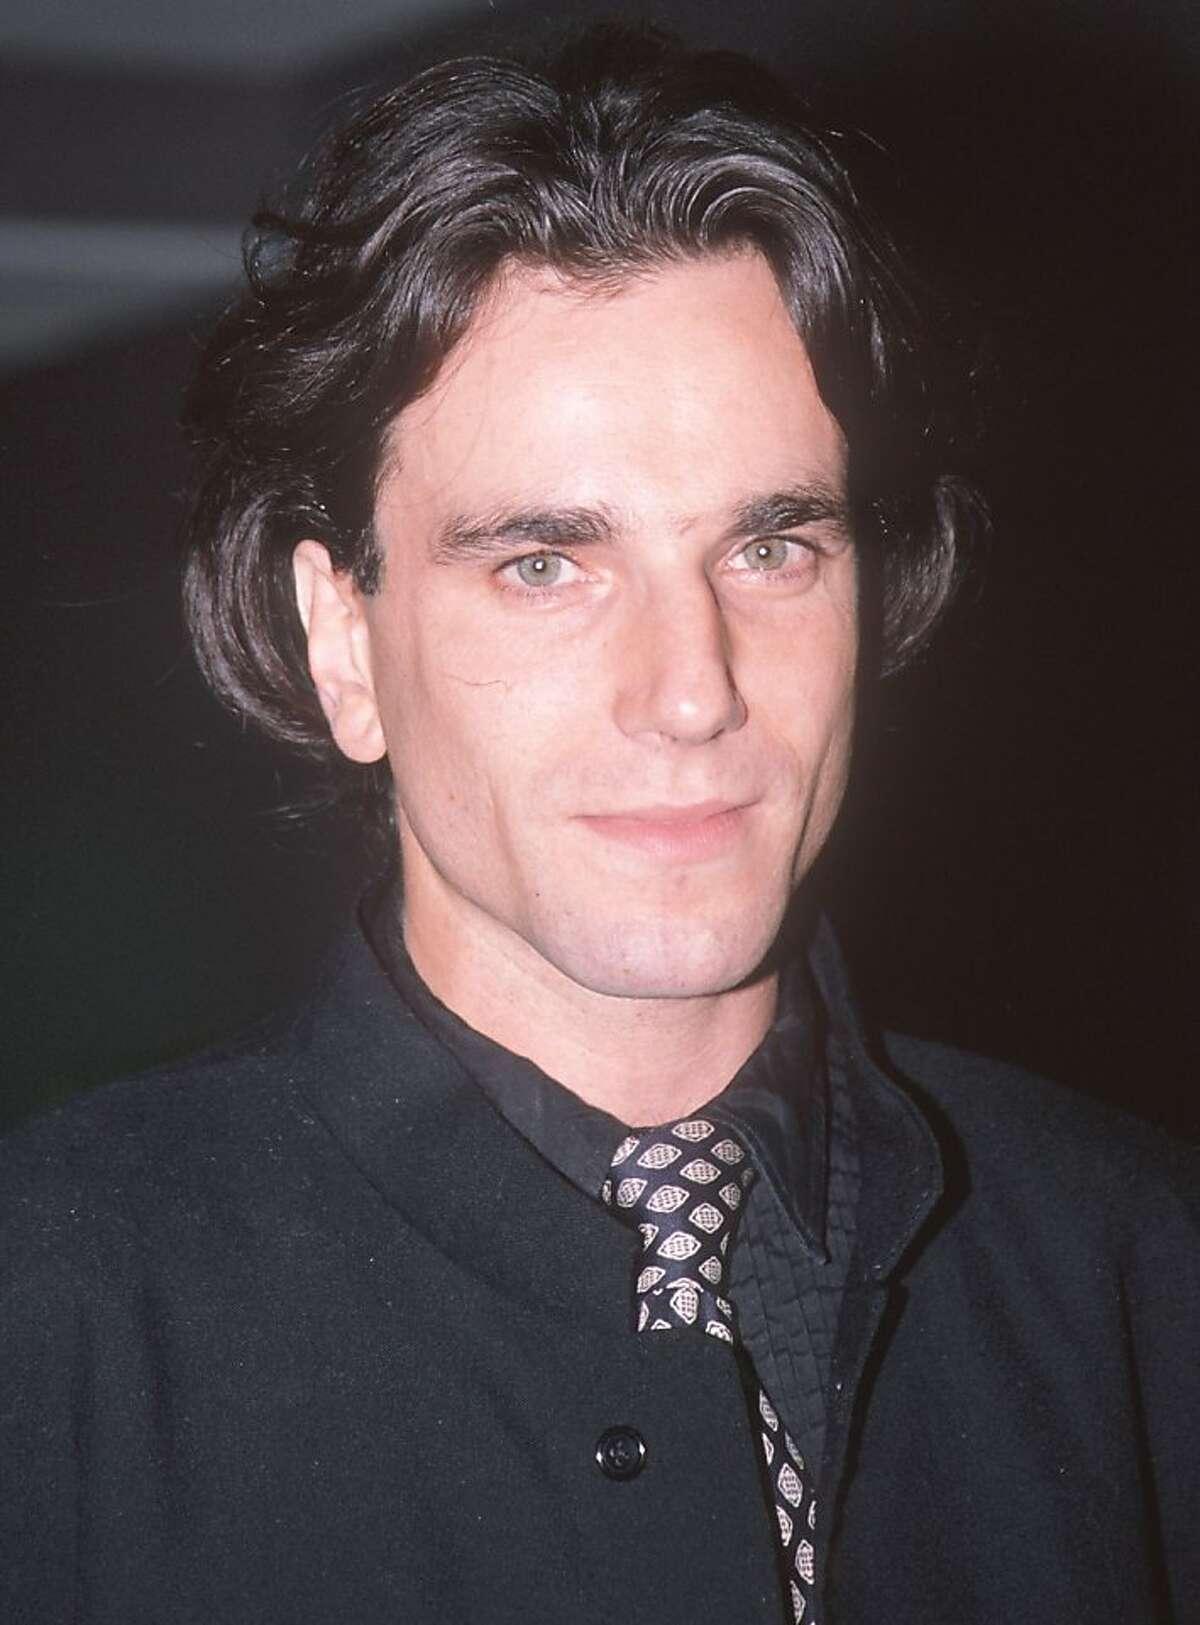 Daniel Day-Lewis, 1989.